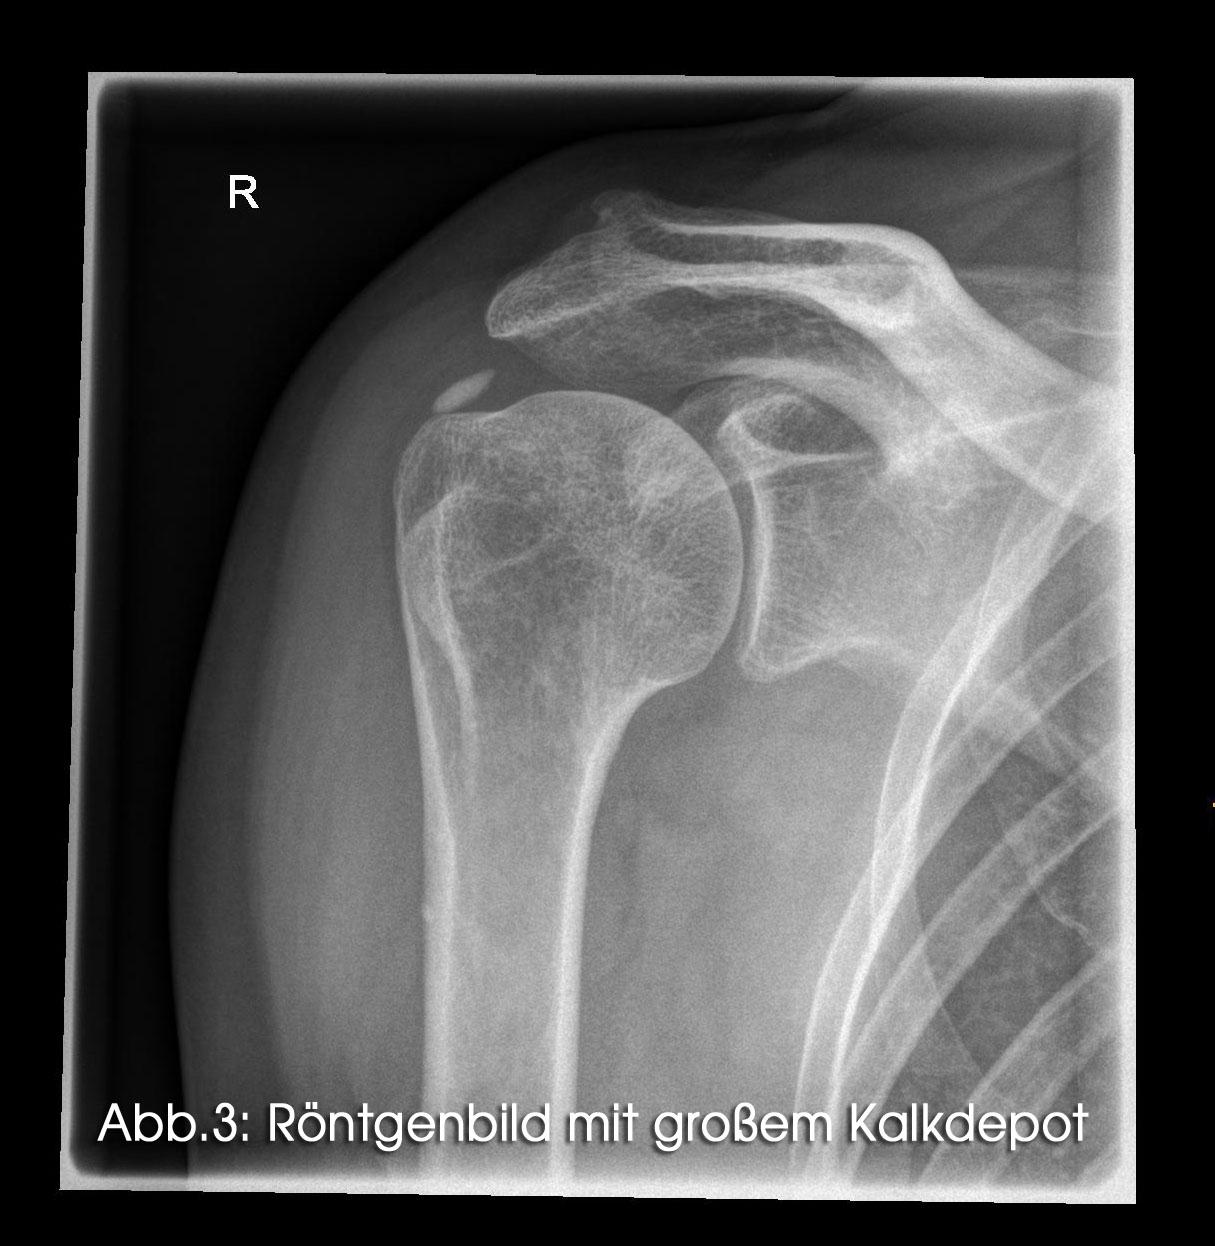 Röntgenbild mit großem Kalkdepot